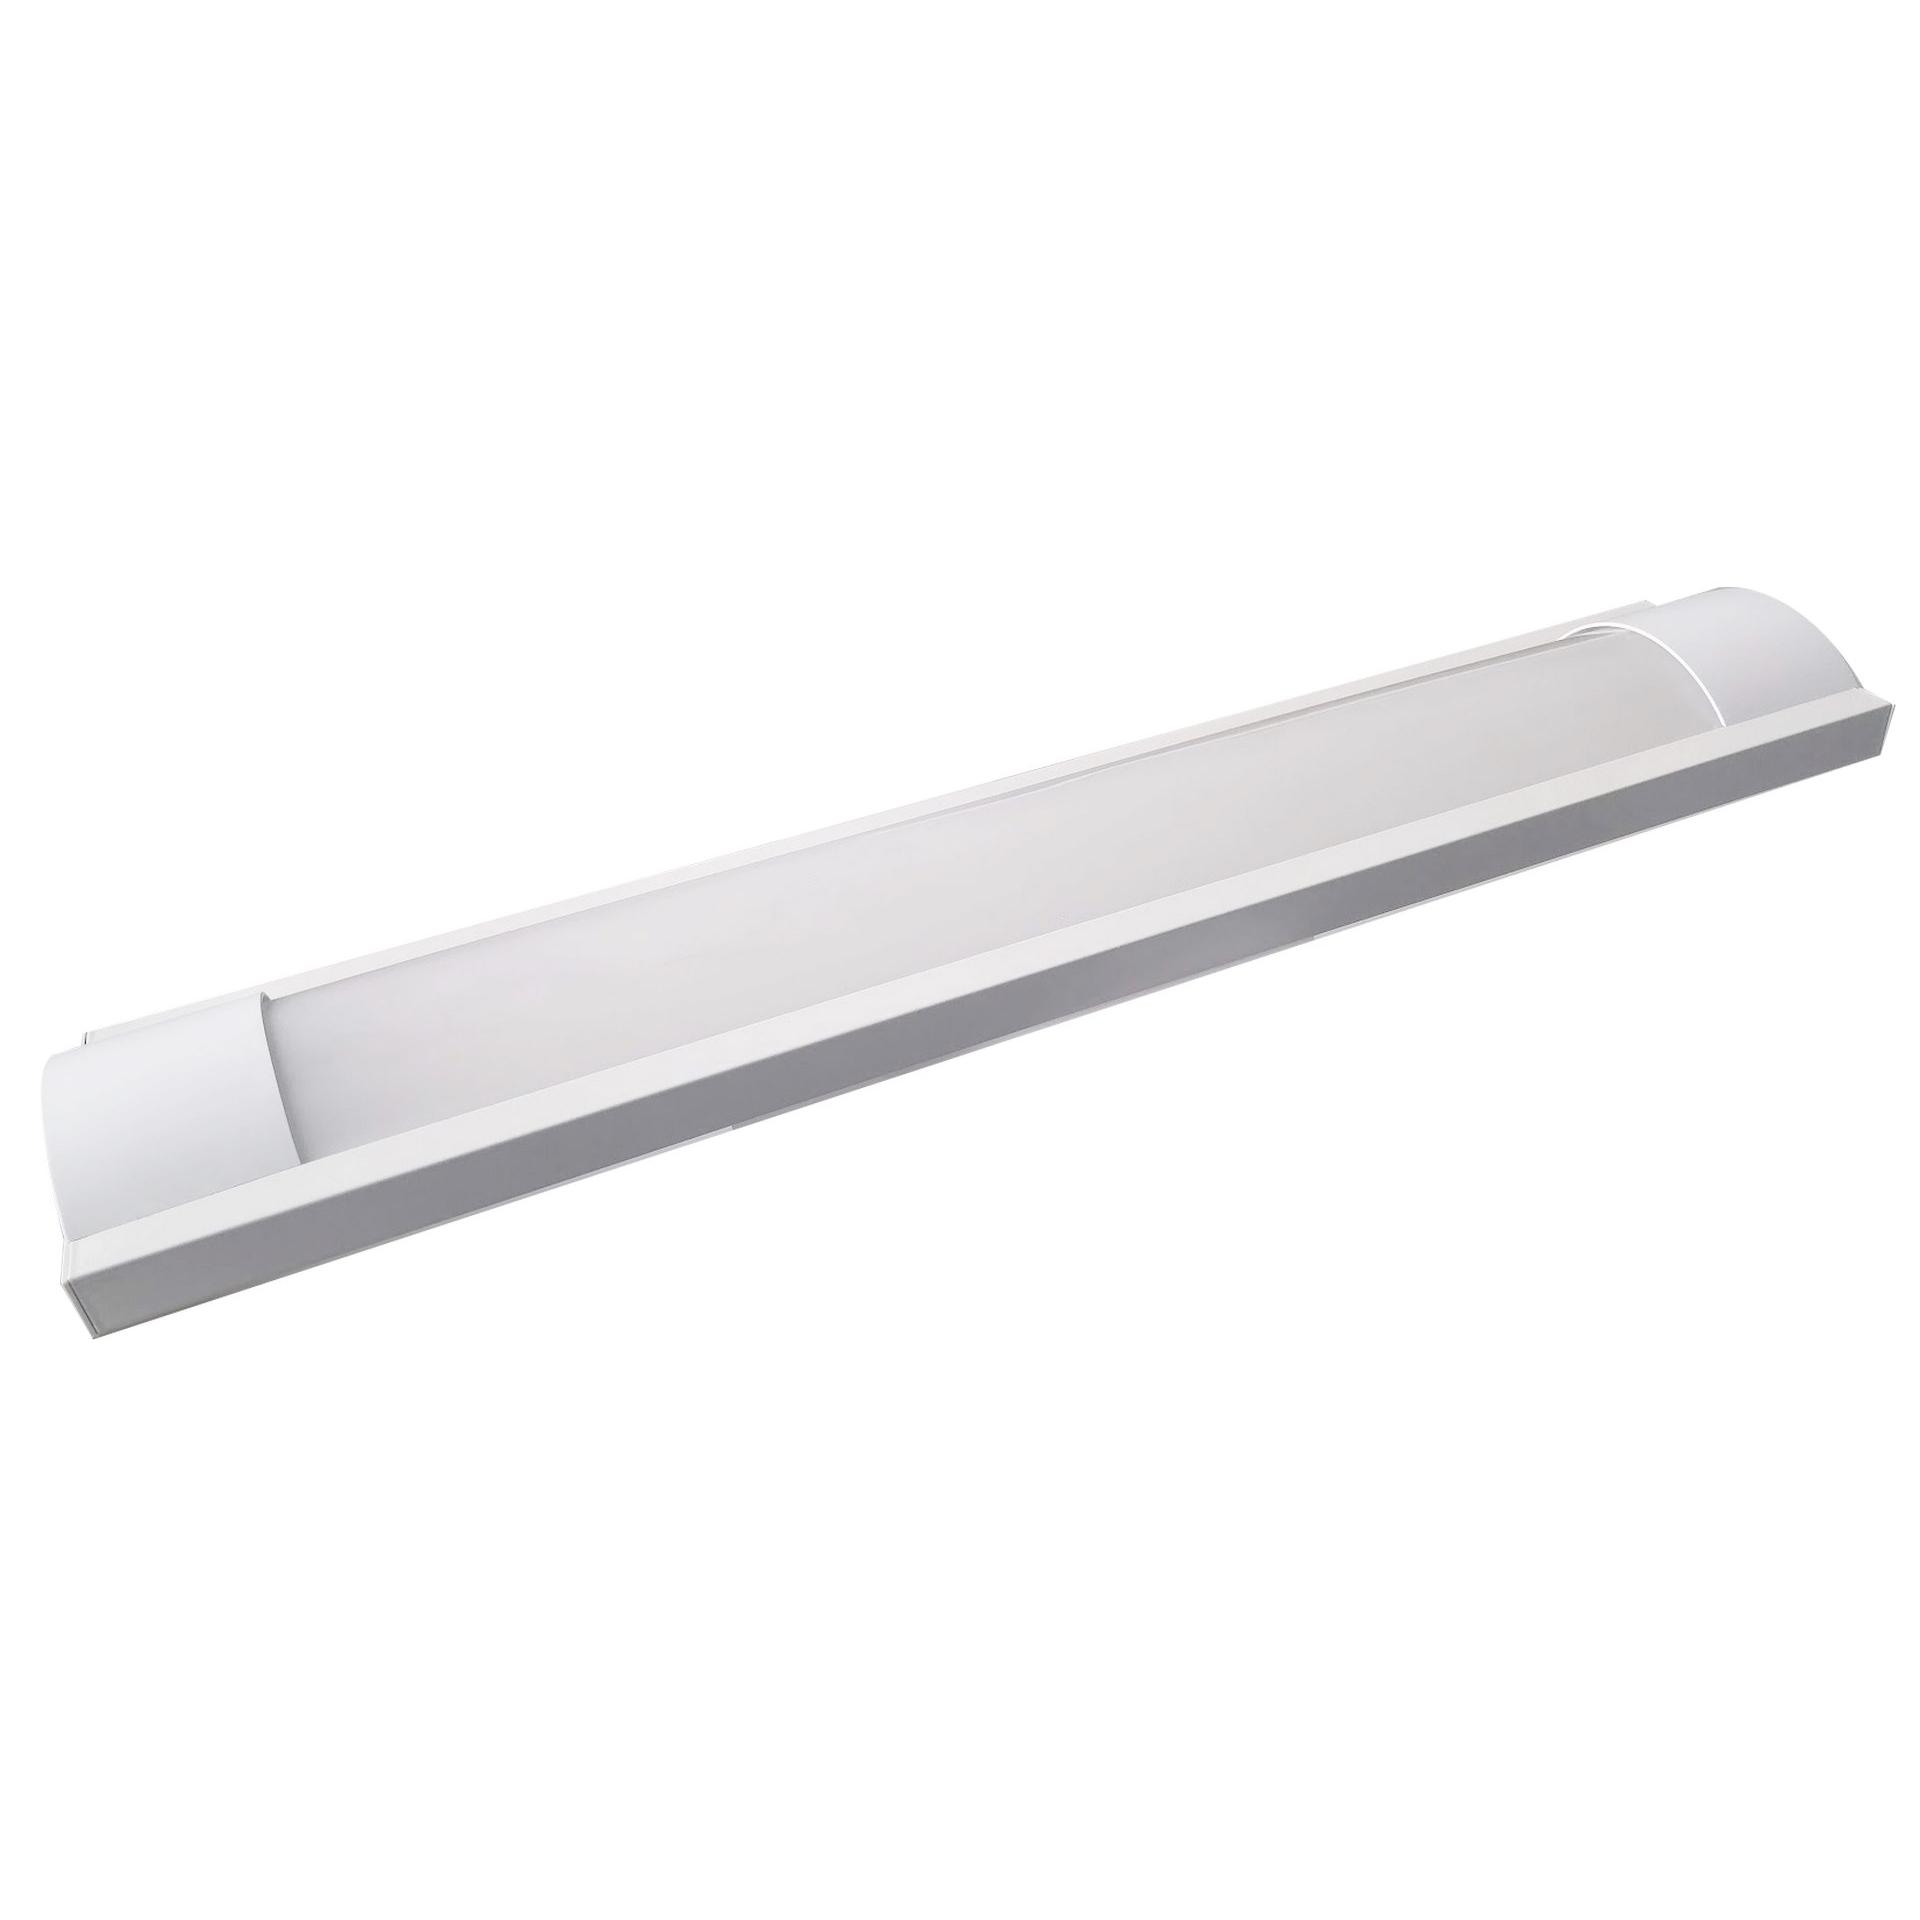 LED přisazené svítidlo AURA 18W NW - Greenlux (GXLS161)